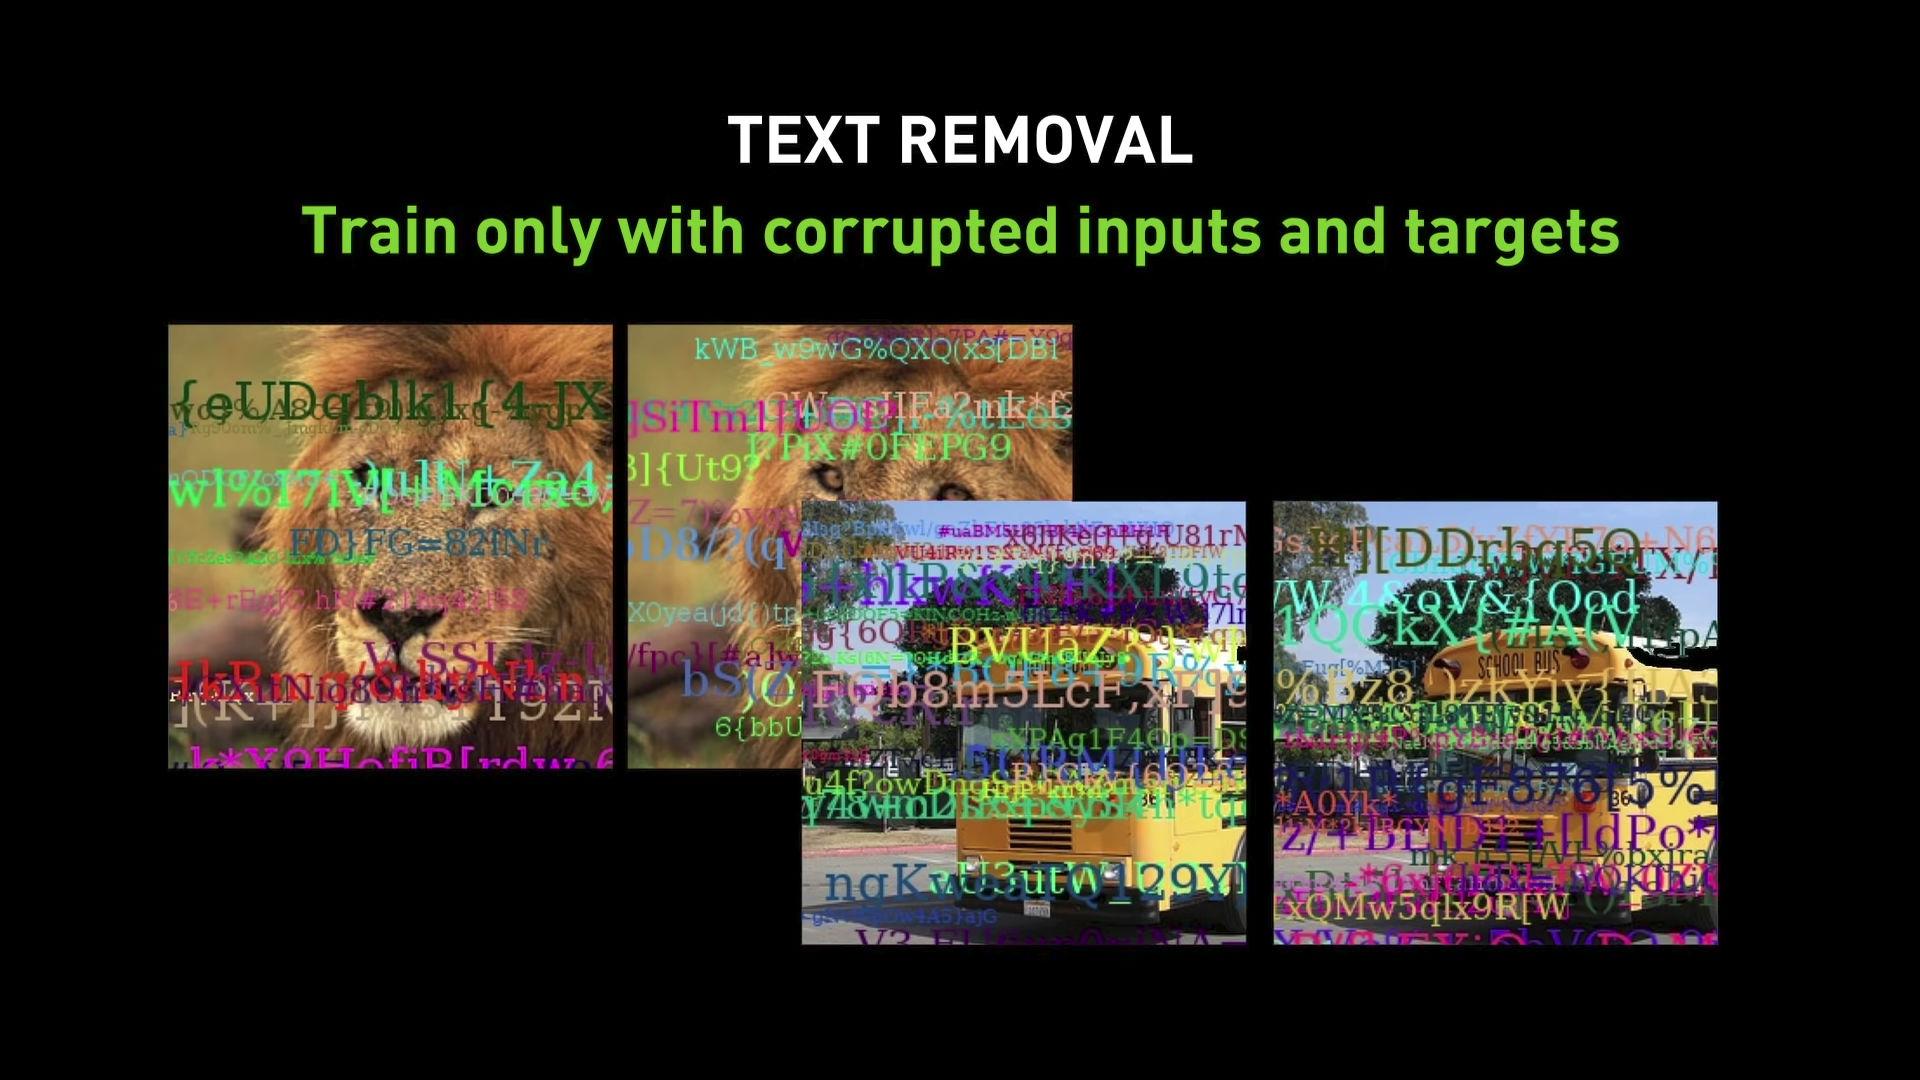 nvidia ai watermark removal image